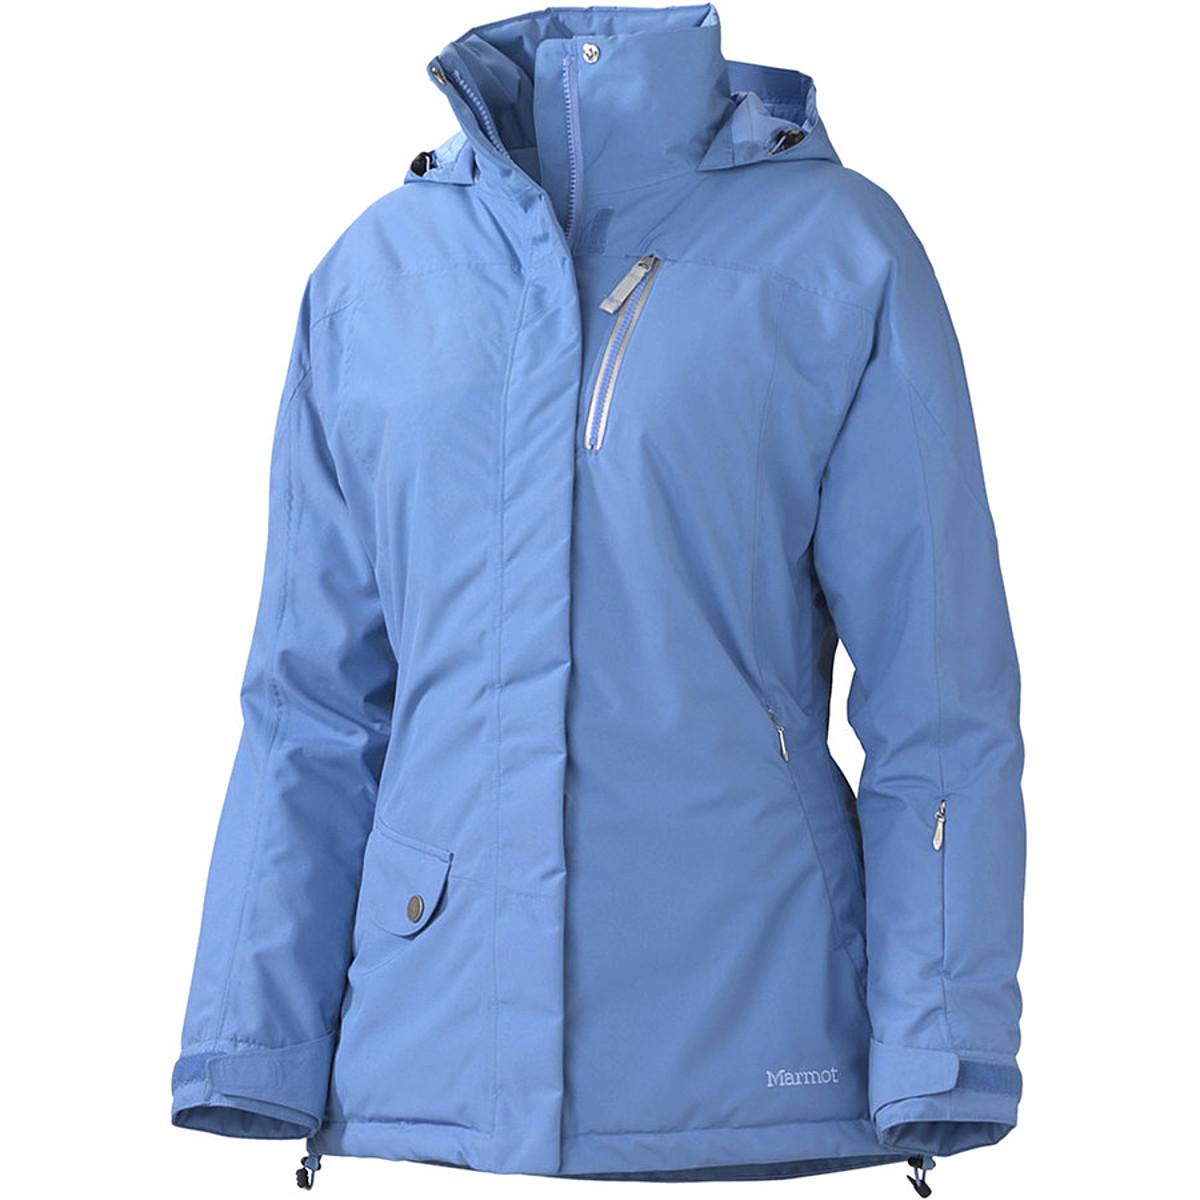 Marmot Courcheval Jacket